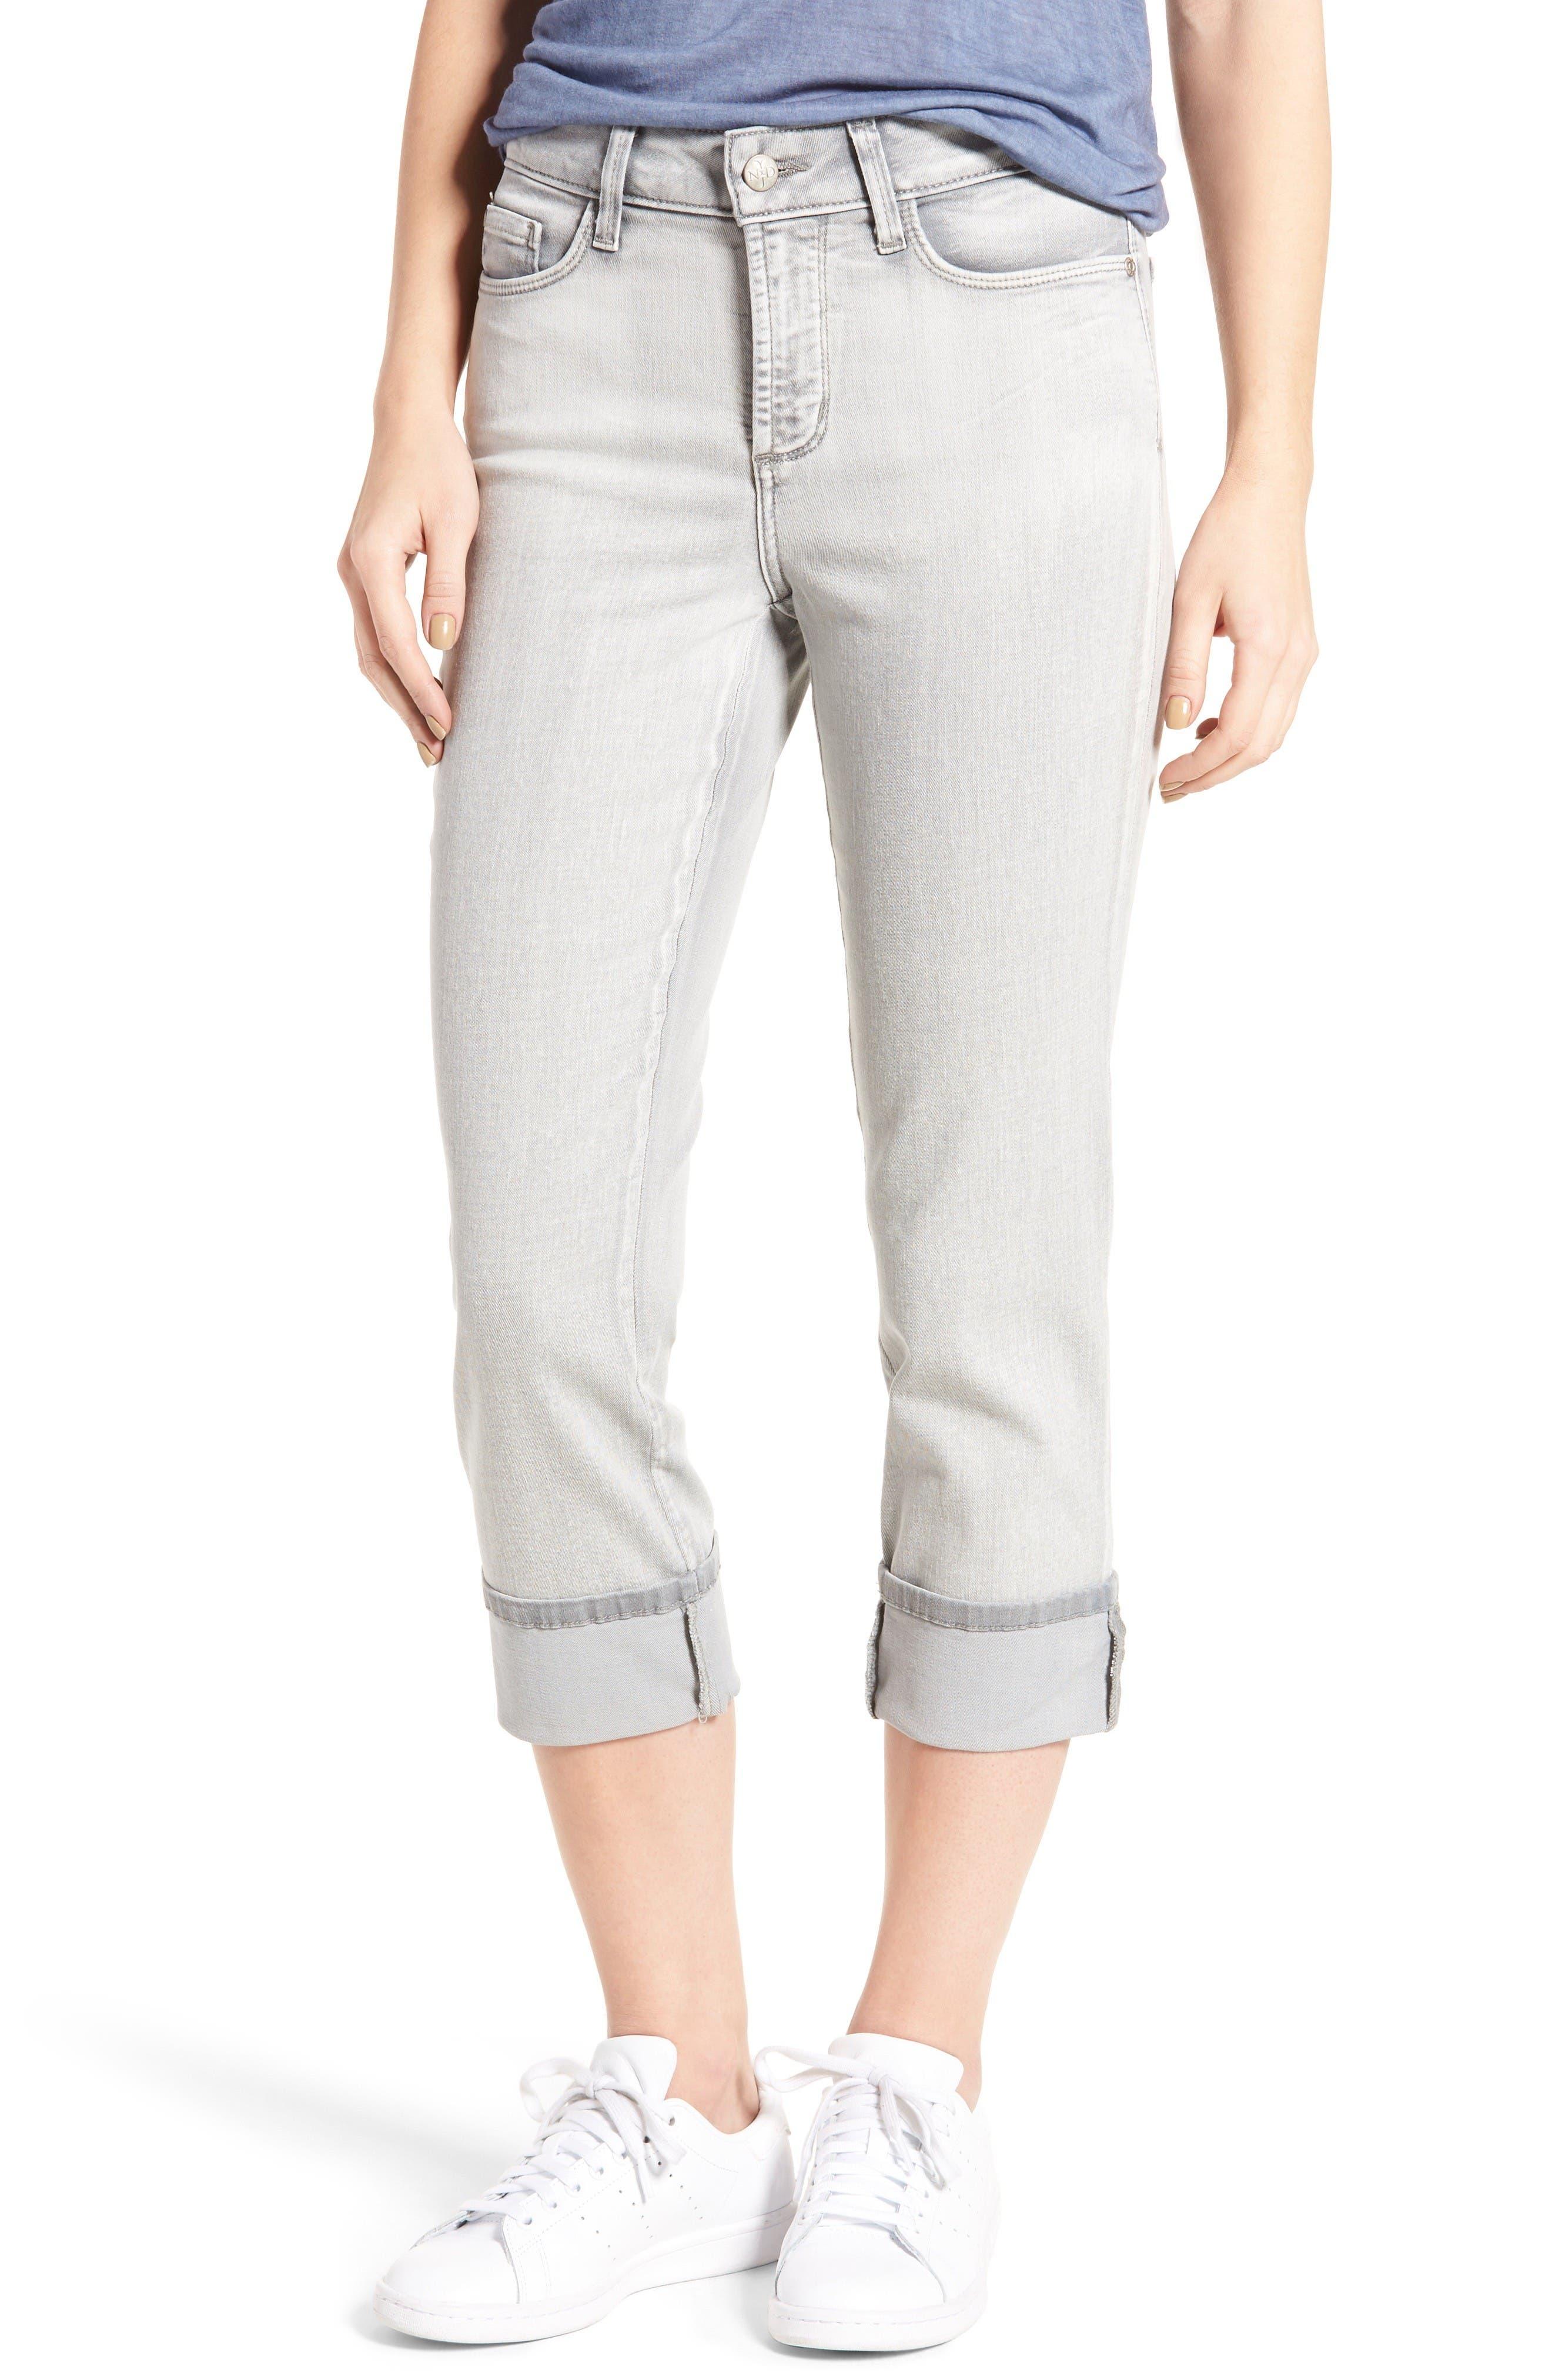 Main Image - NYDJ 'Dayla' Colored Wide Cuff Capri Jeans (Regular & Petite)